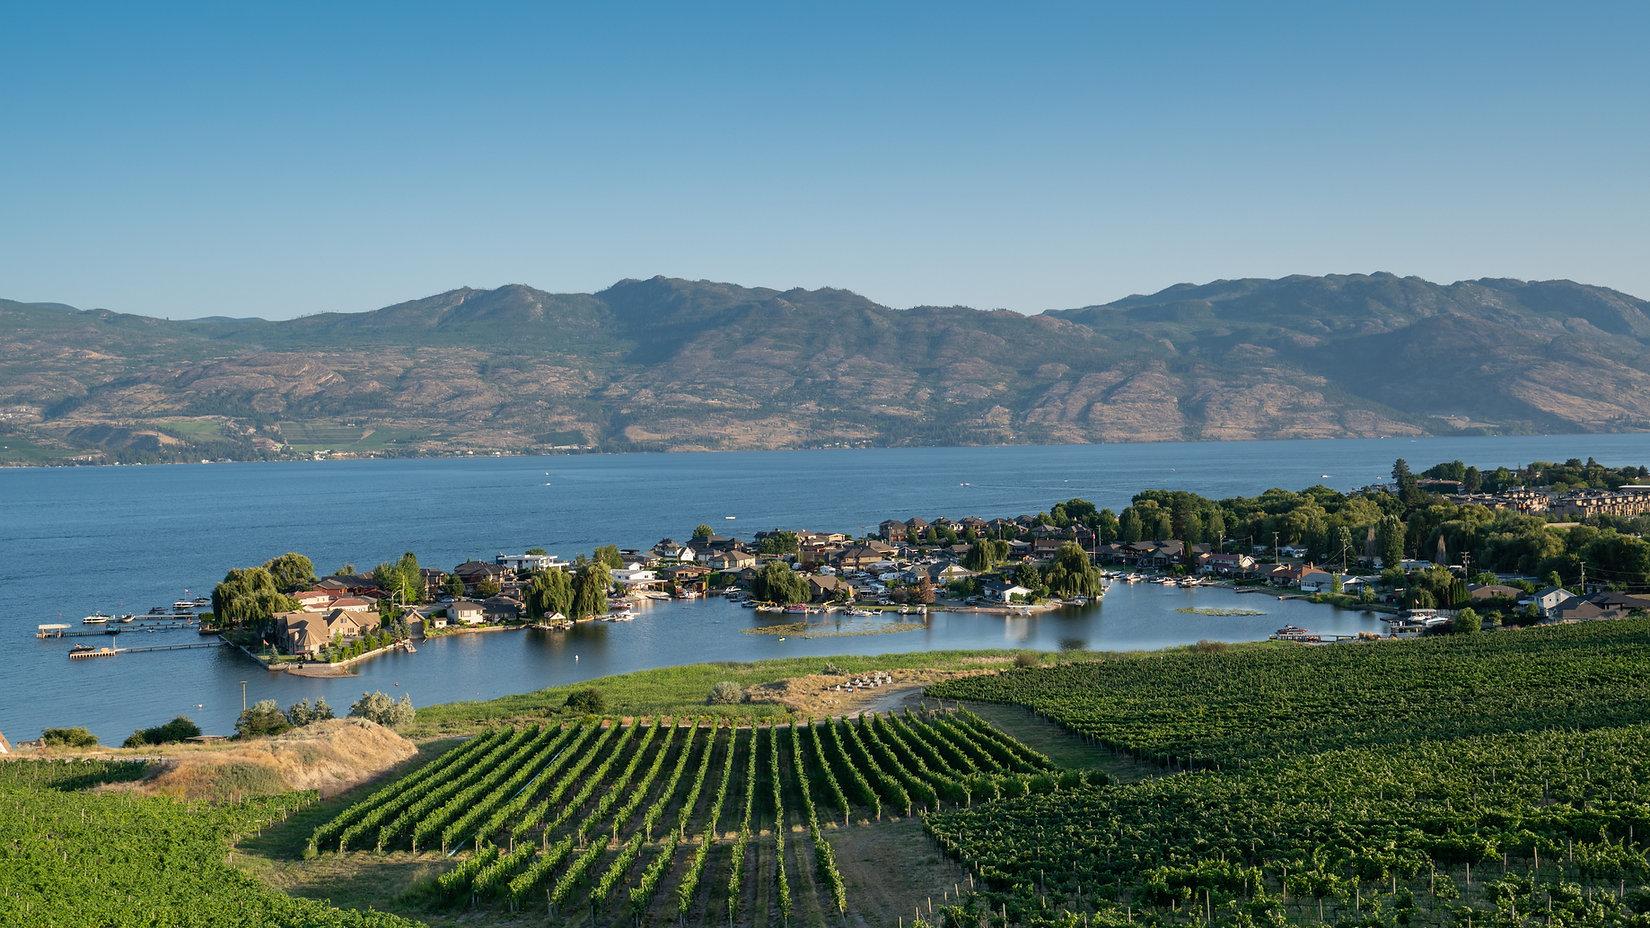 Summer Winery View. Aerial view of Kelow